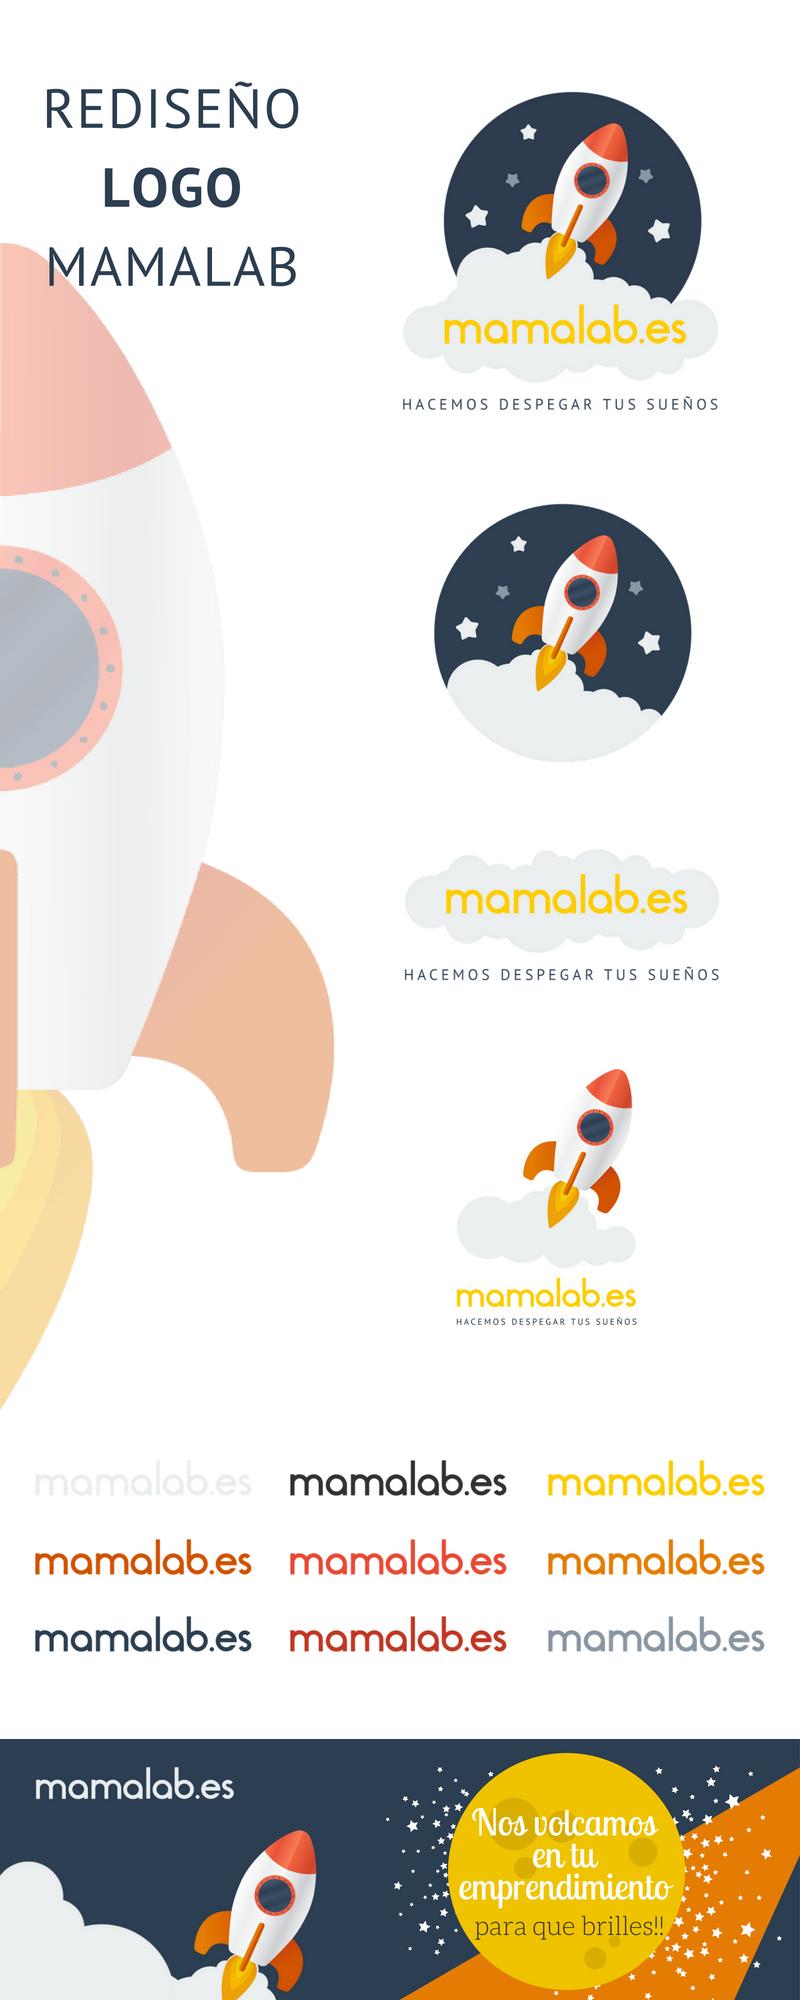 mamalab styleguide